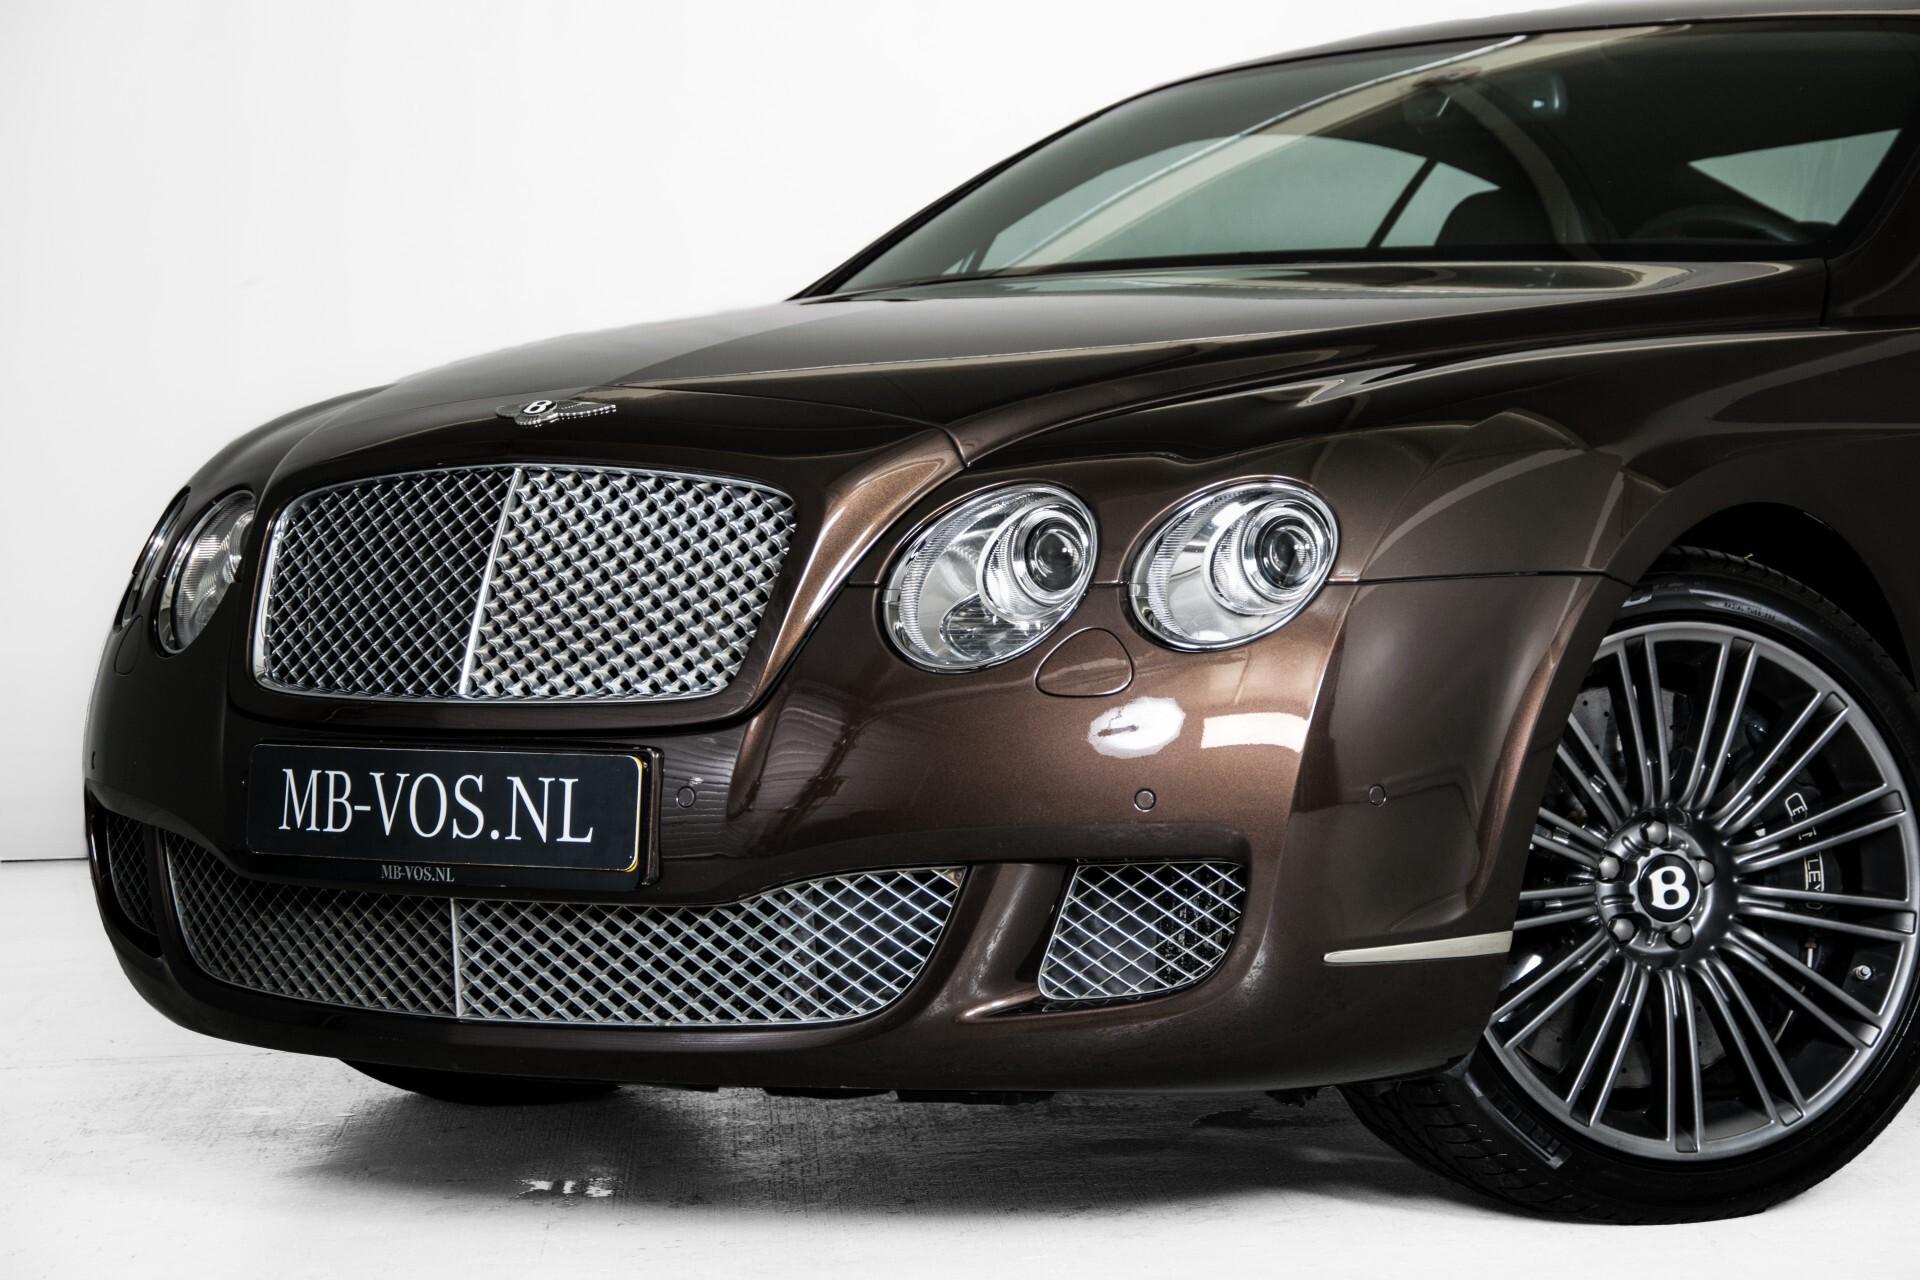 Bentley Continental GT 6.0 W12 GT Speed Ceramic Brakes/Mulliner/Standkachel/Keyless Aut6 Foto 56